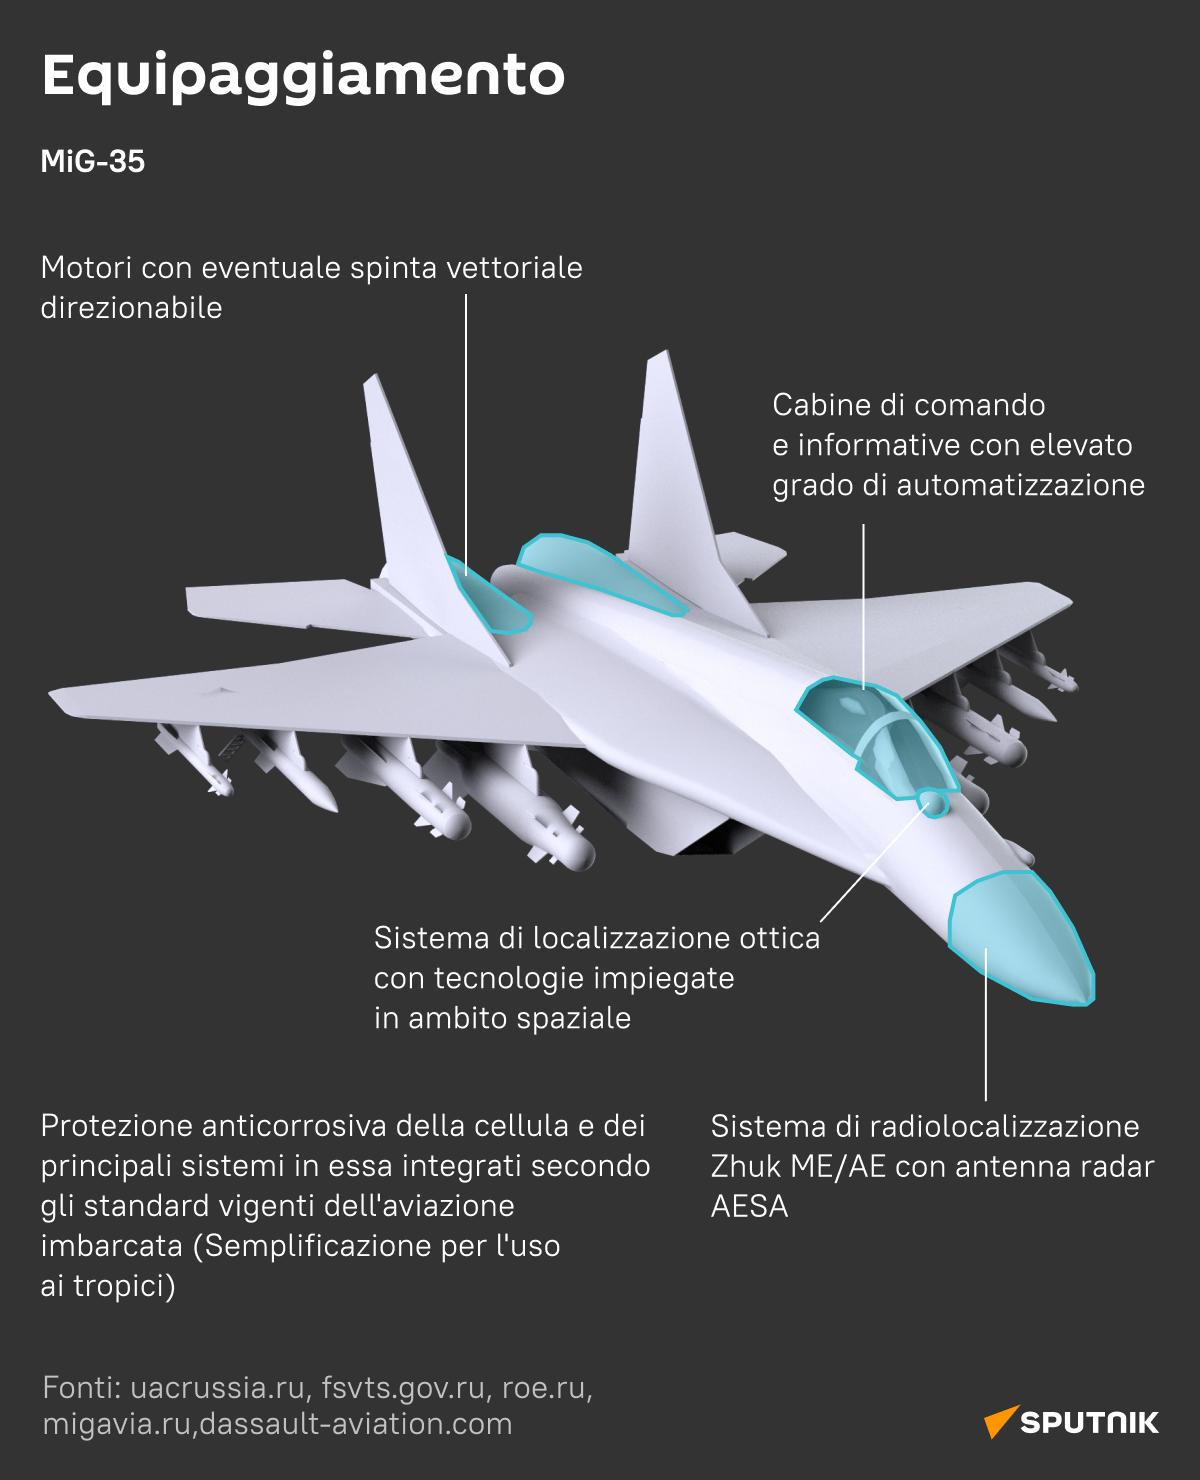 Il russo MiG-35 vs il francese Rafale 5 - Sputnik Italia